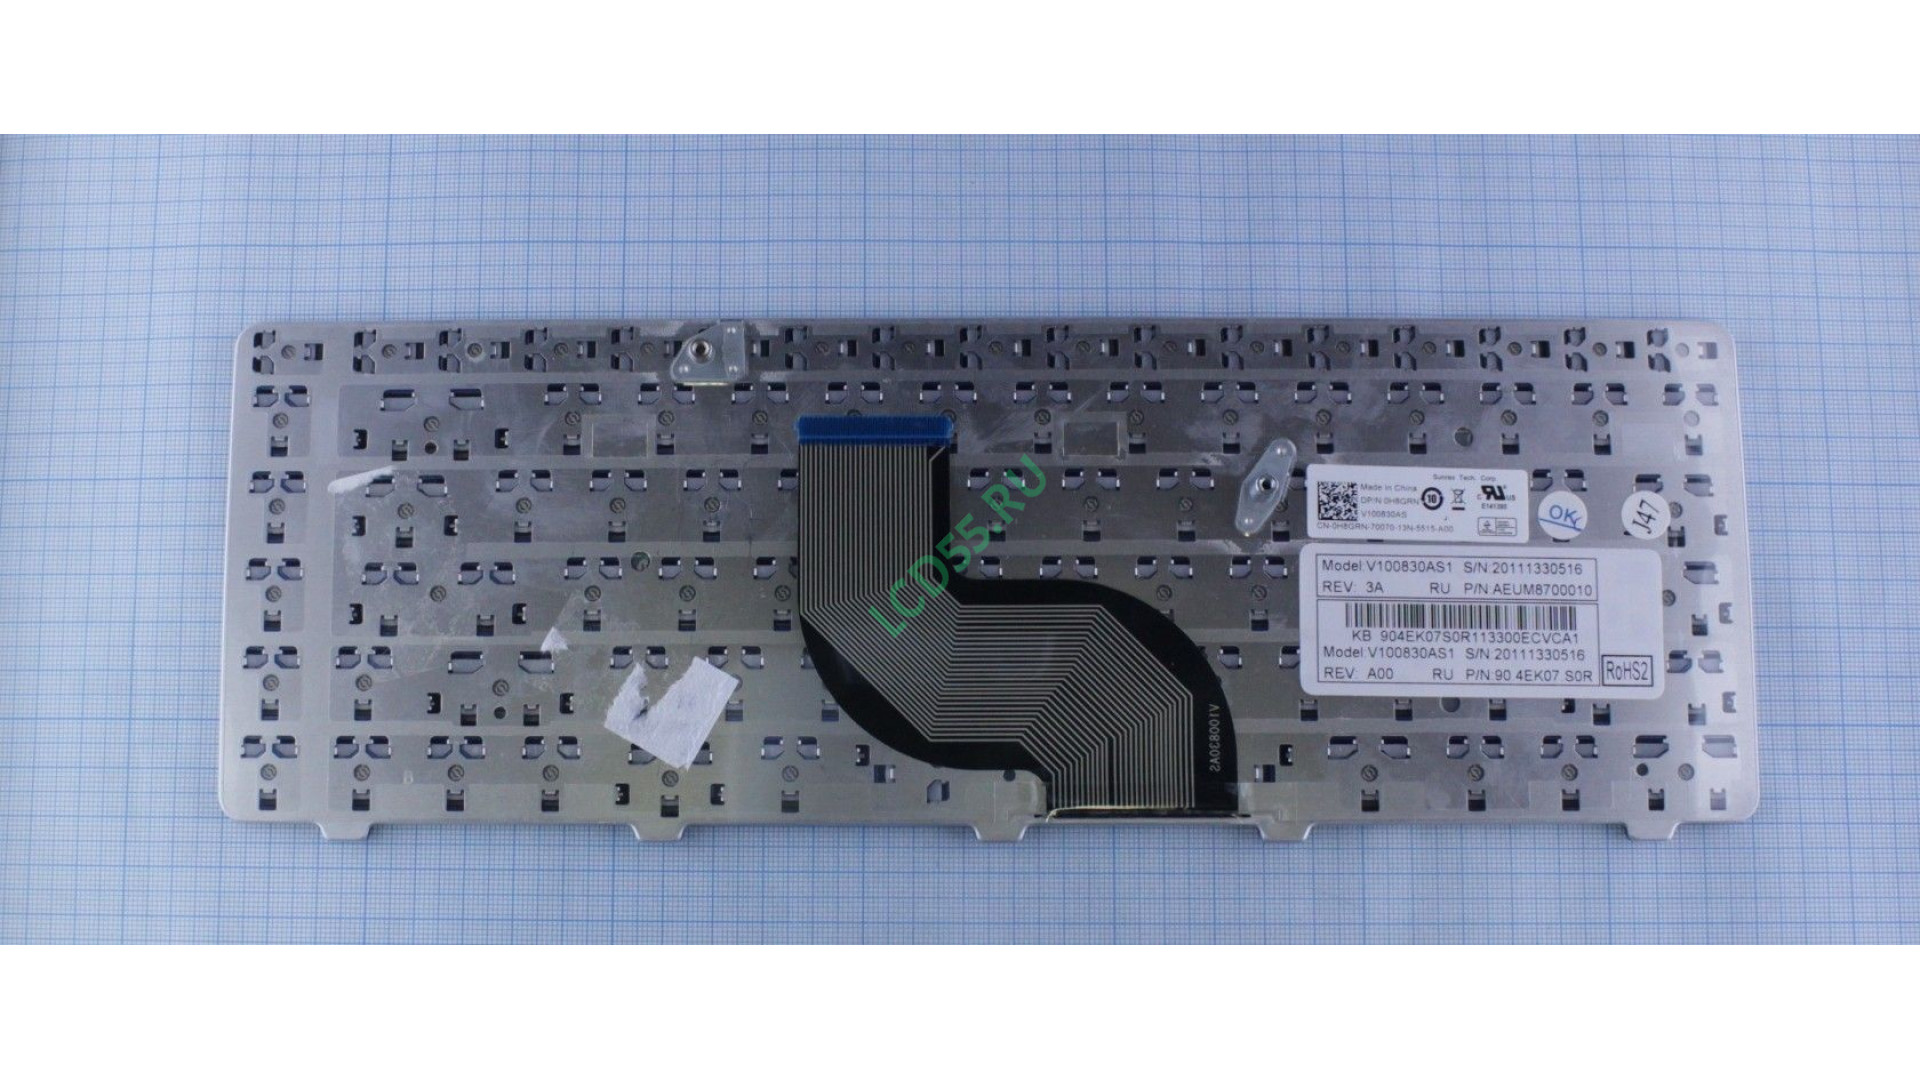 Клавиатура Dell Inspiron 14V, 14R, N4010, N4030, N5030, M5030